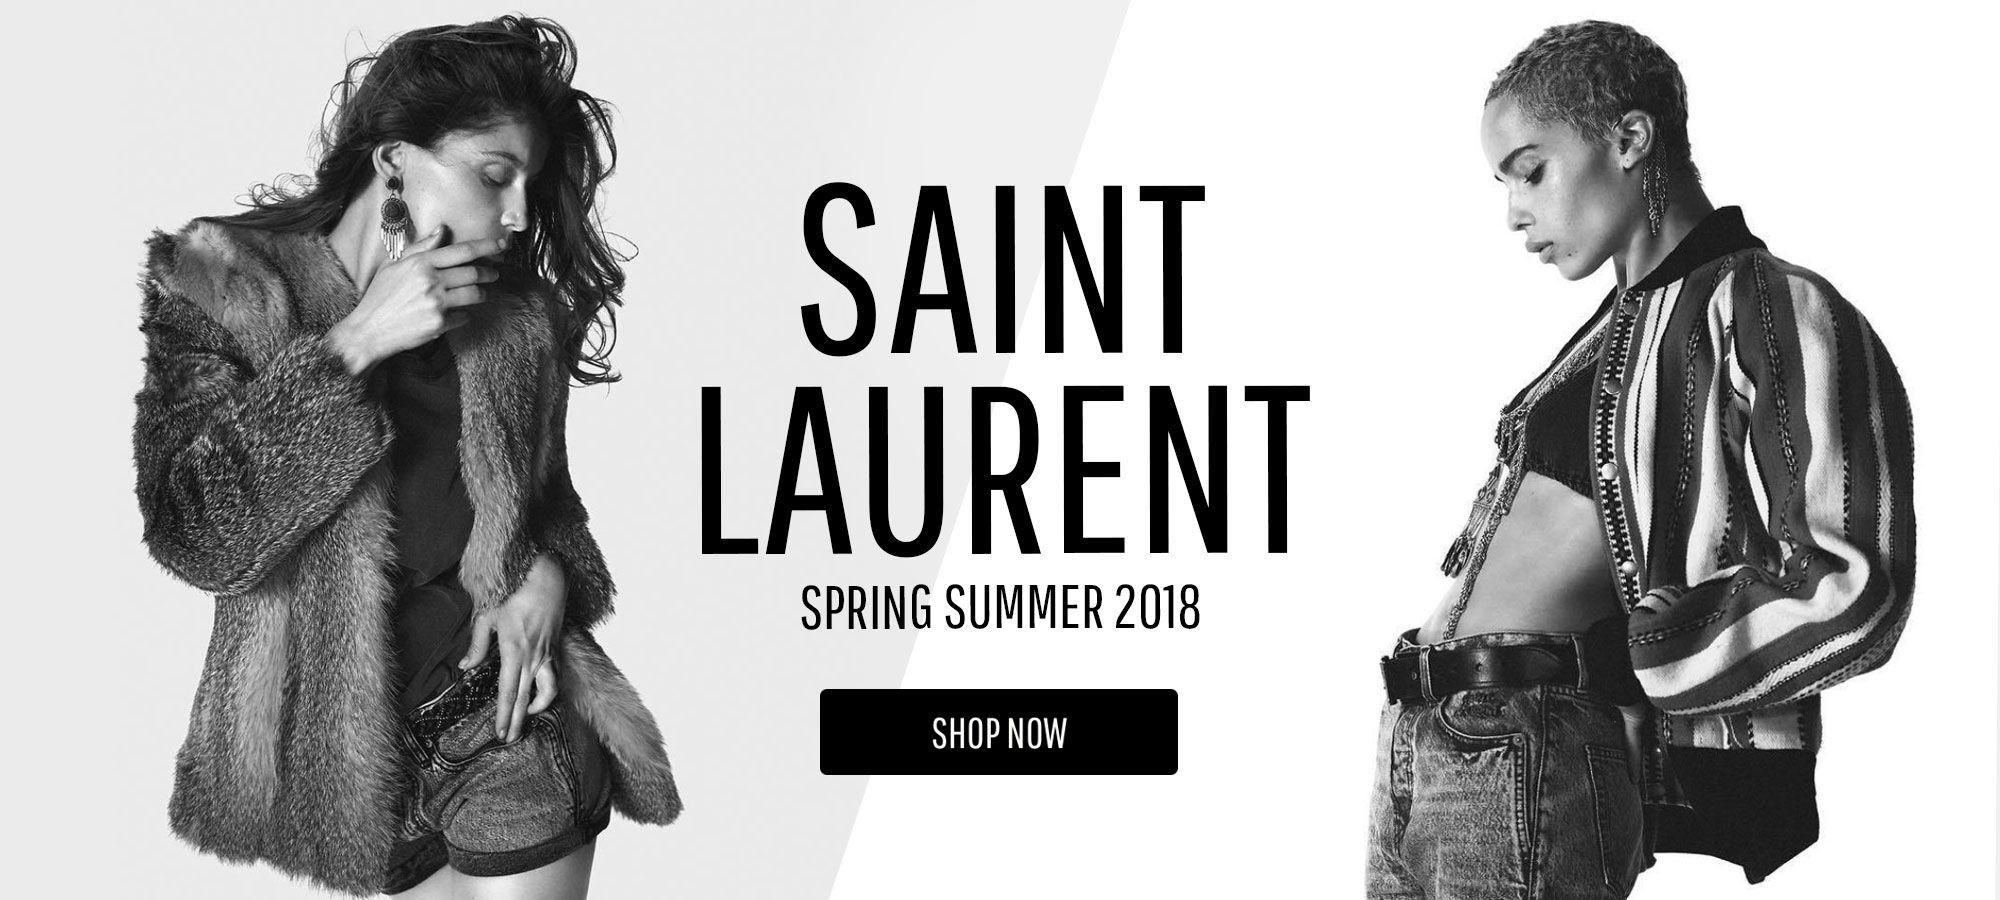 Saint Laurent Women - Spring Summer 2018